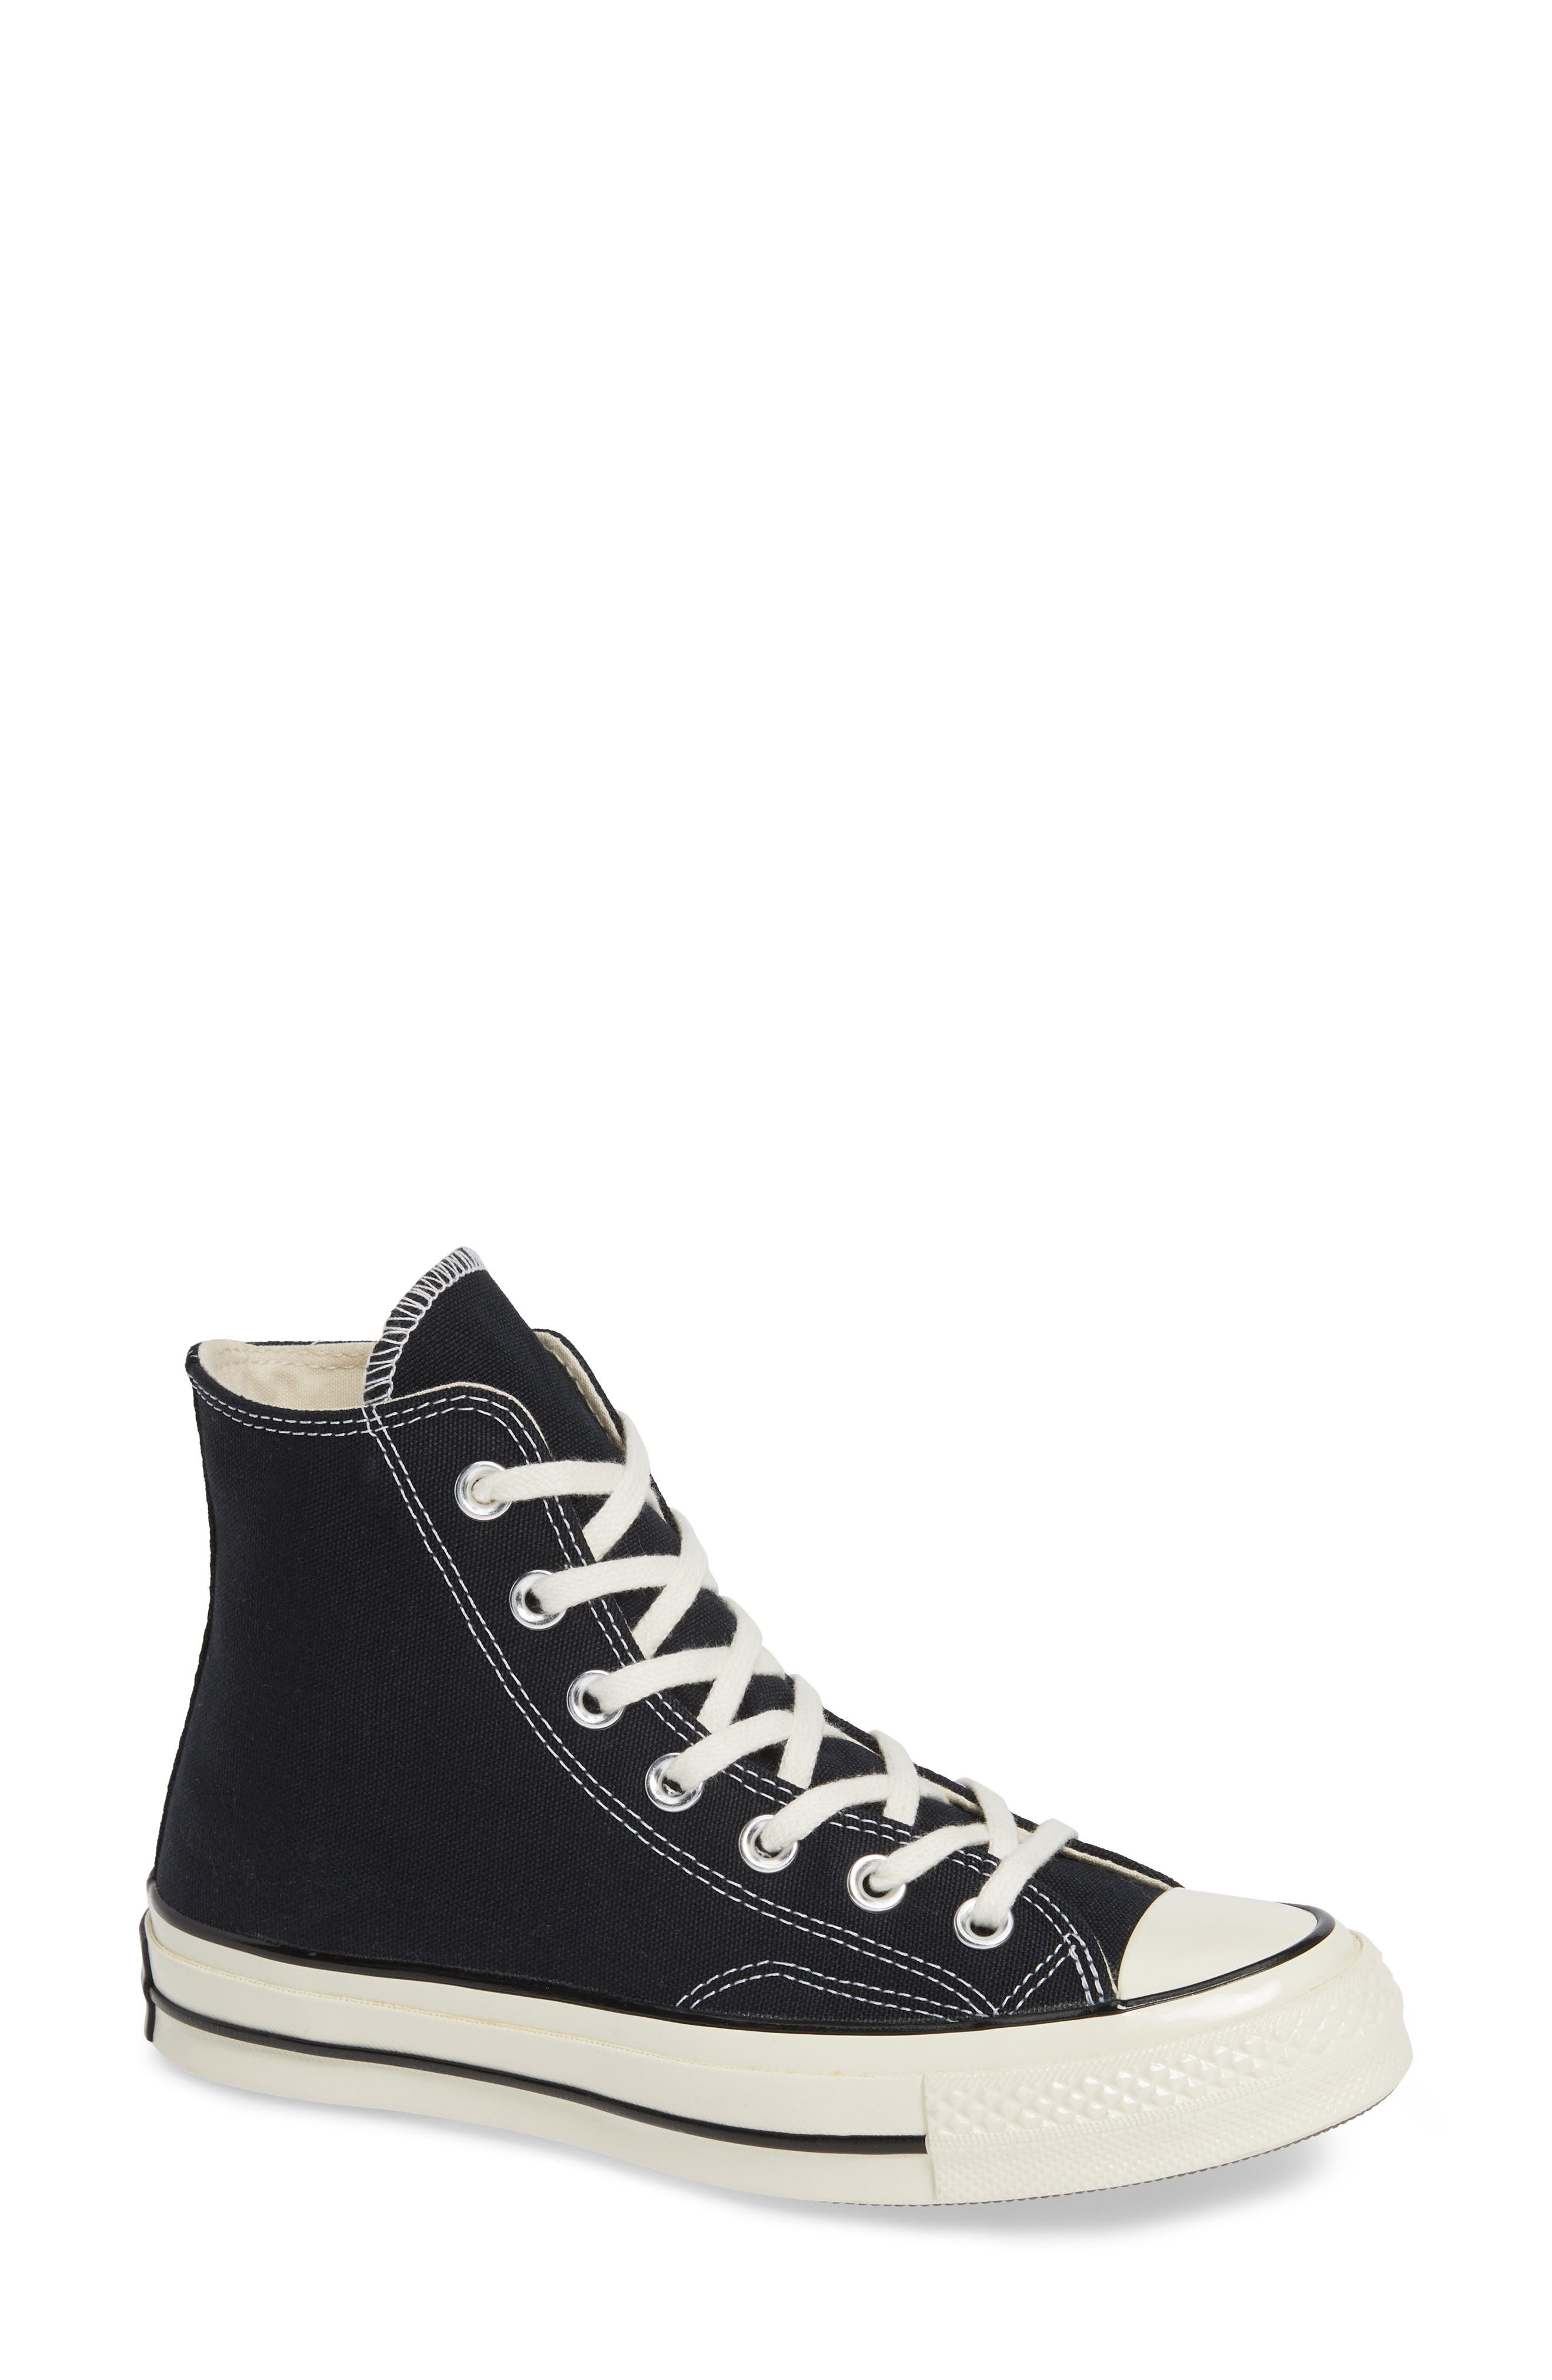 1e82f5c52c5949 ... purchase converse chuck taylor all star chuck 70 high top sneaker women  00def 7da42